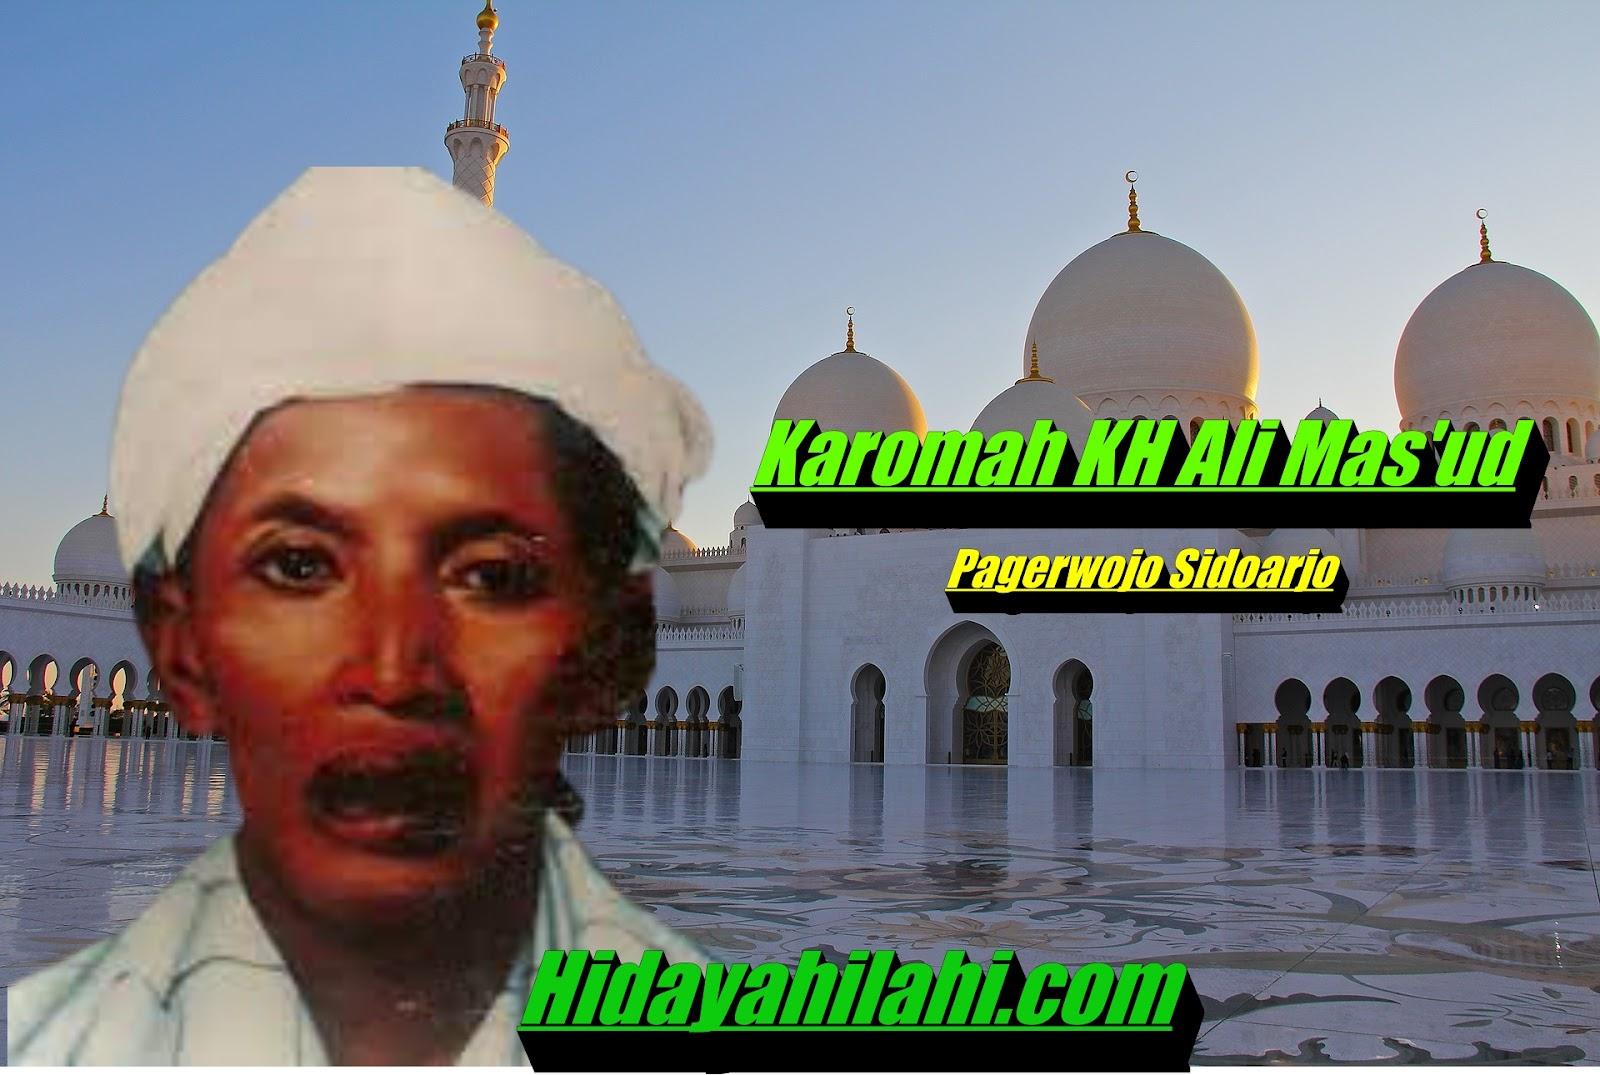 Hidayahilahi.com